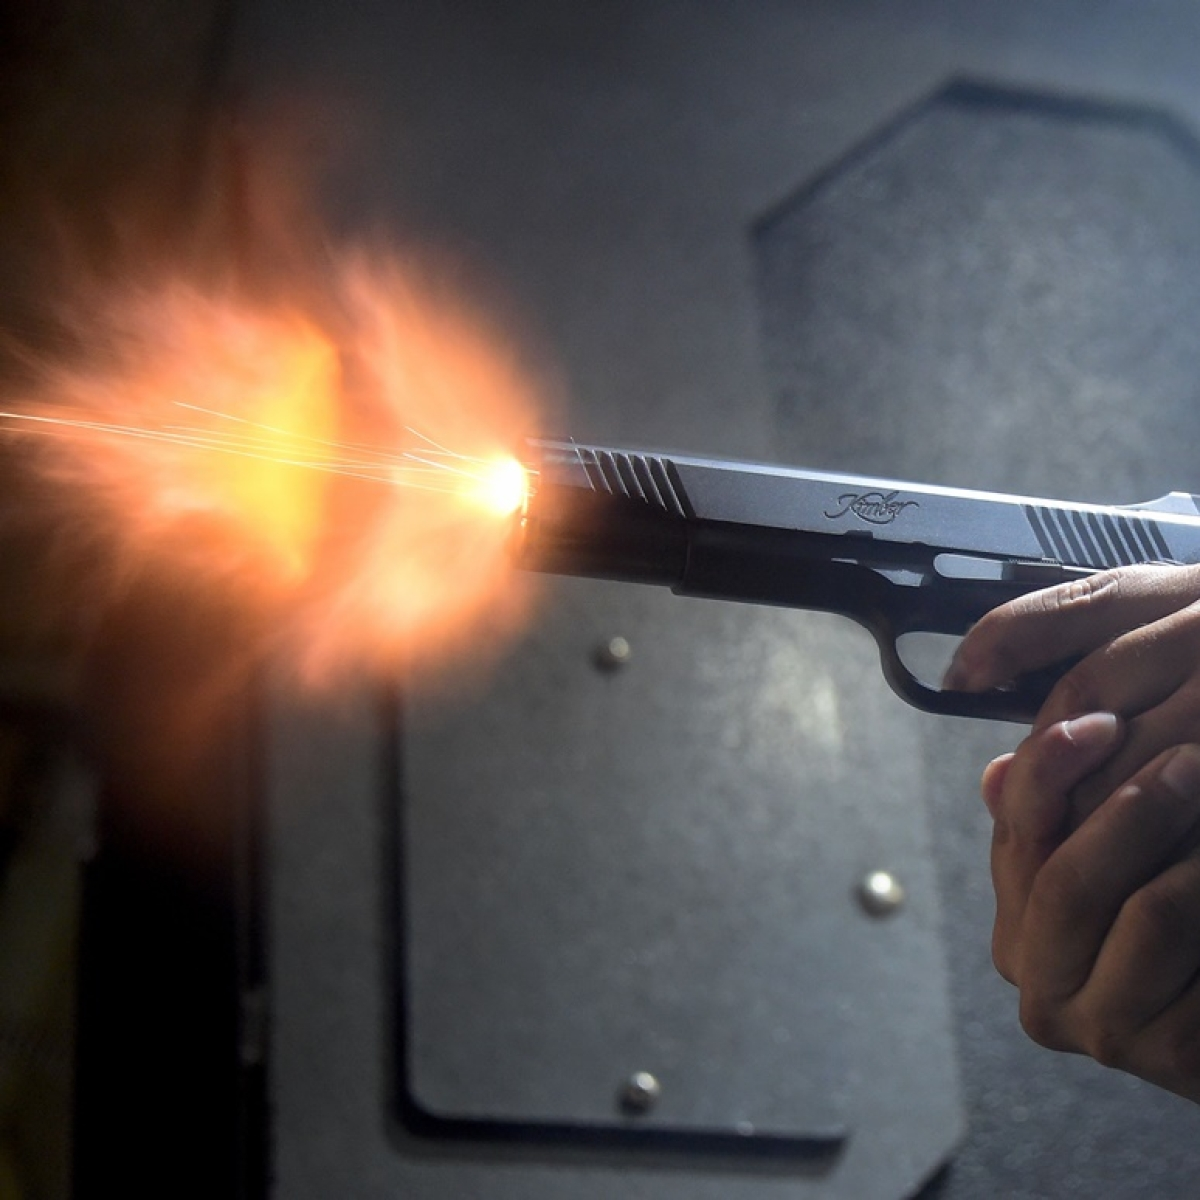 Thane Crime: 48-year-old real estate developer shot dead in Kalyan